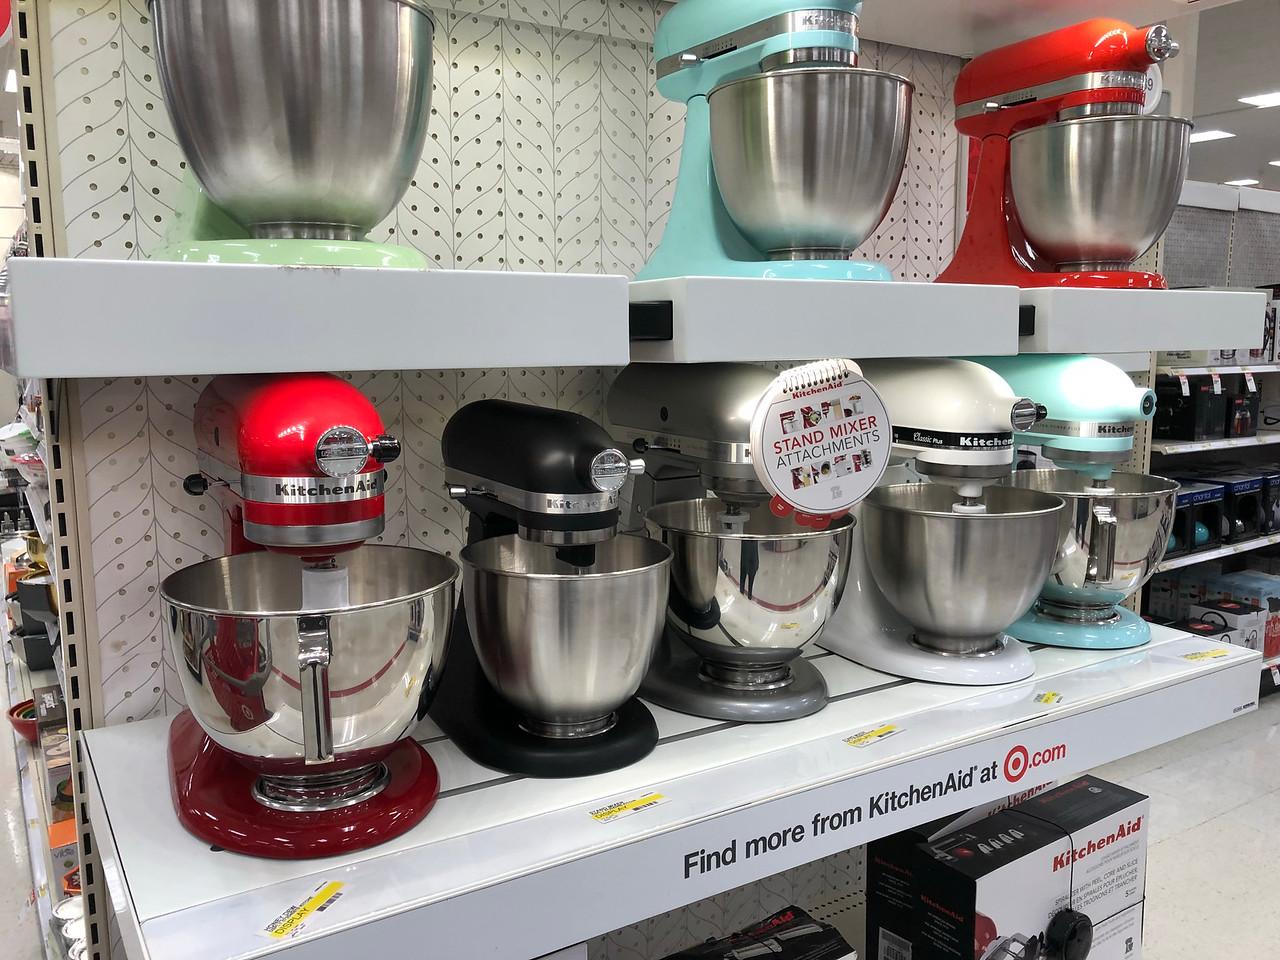 best target black friday 2018 deals – kitchenaid mixers